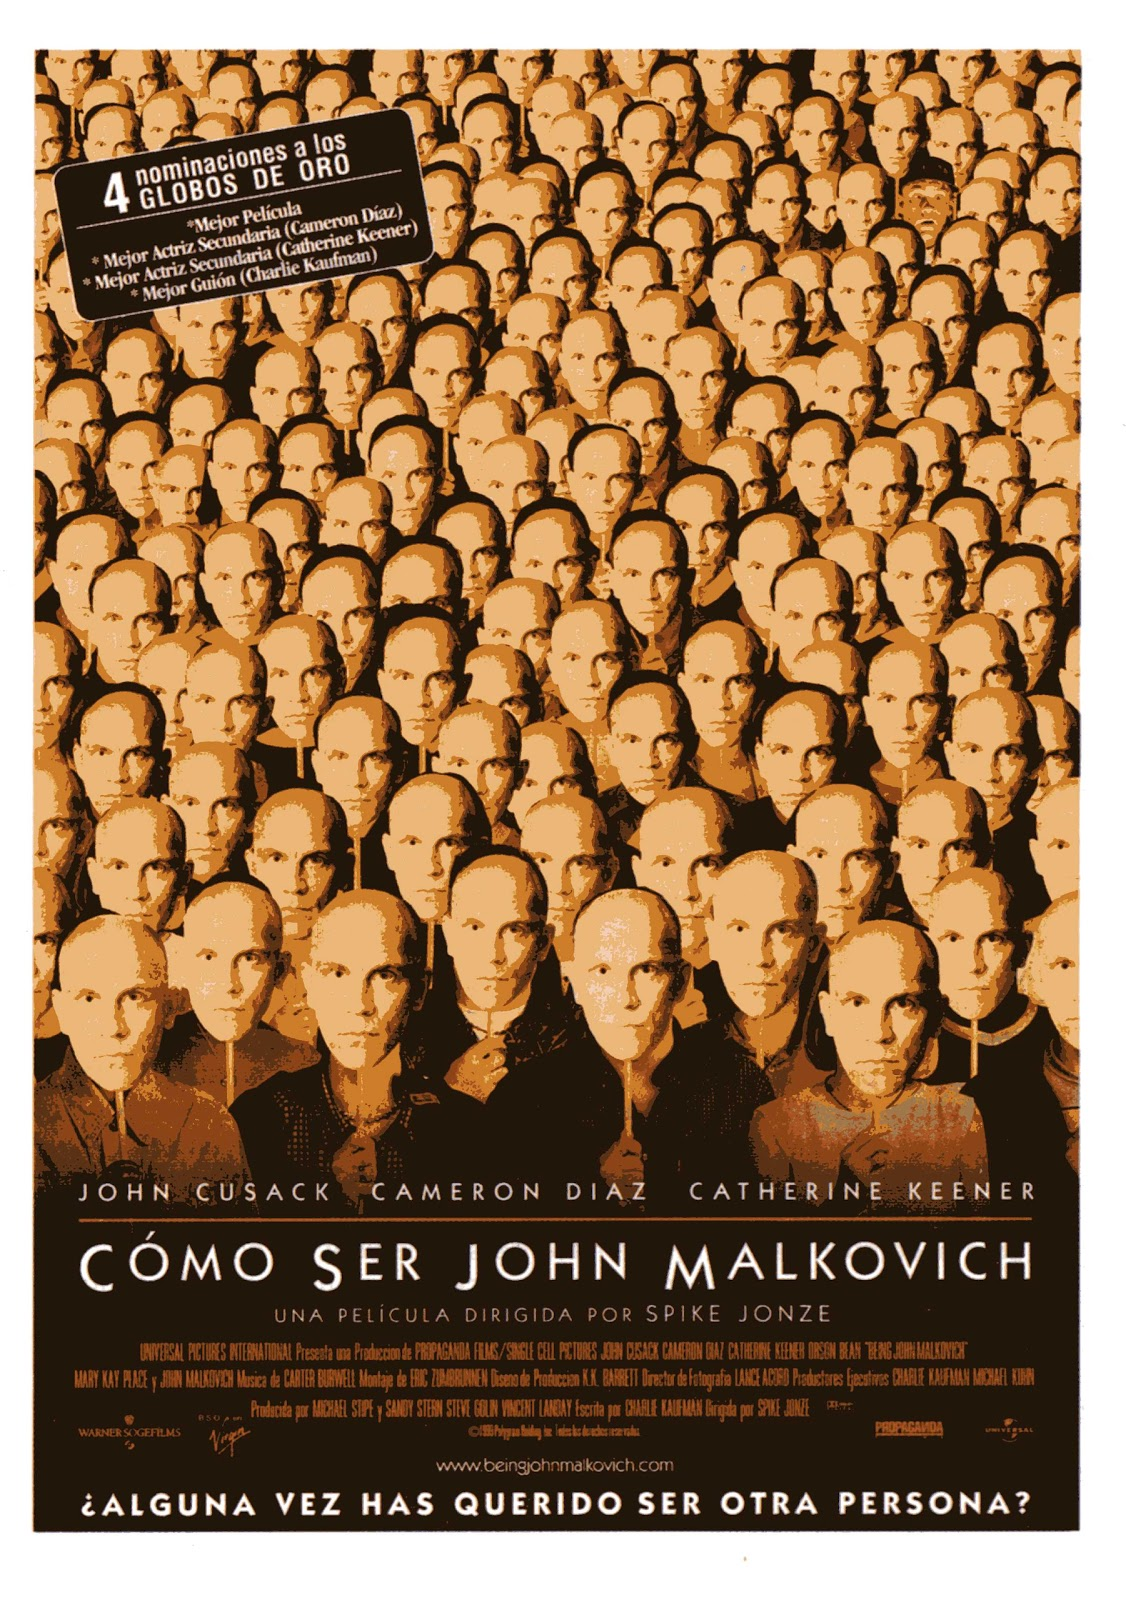 http://4.bp.blogspot.com/-F9MgpM0kcNc/TxBrG4JiOoI/AAAAAAAAA3U/gVY9-NppE3w/s1600/0353+Como+ser+John+Malkovich.jpg